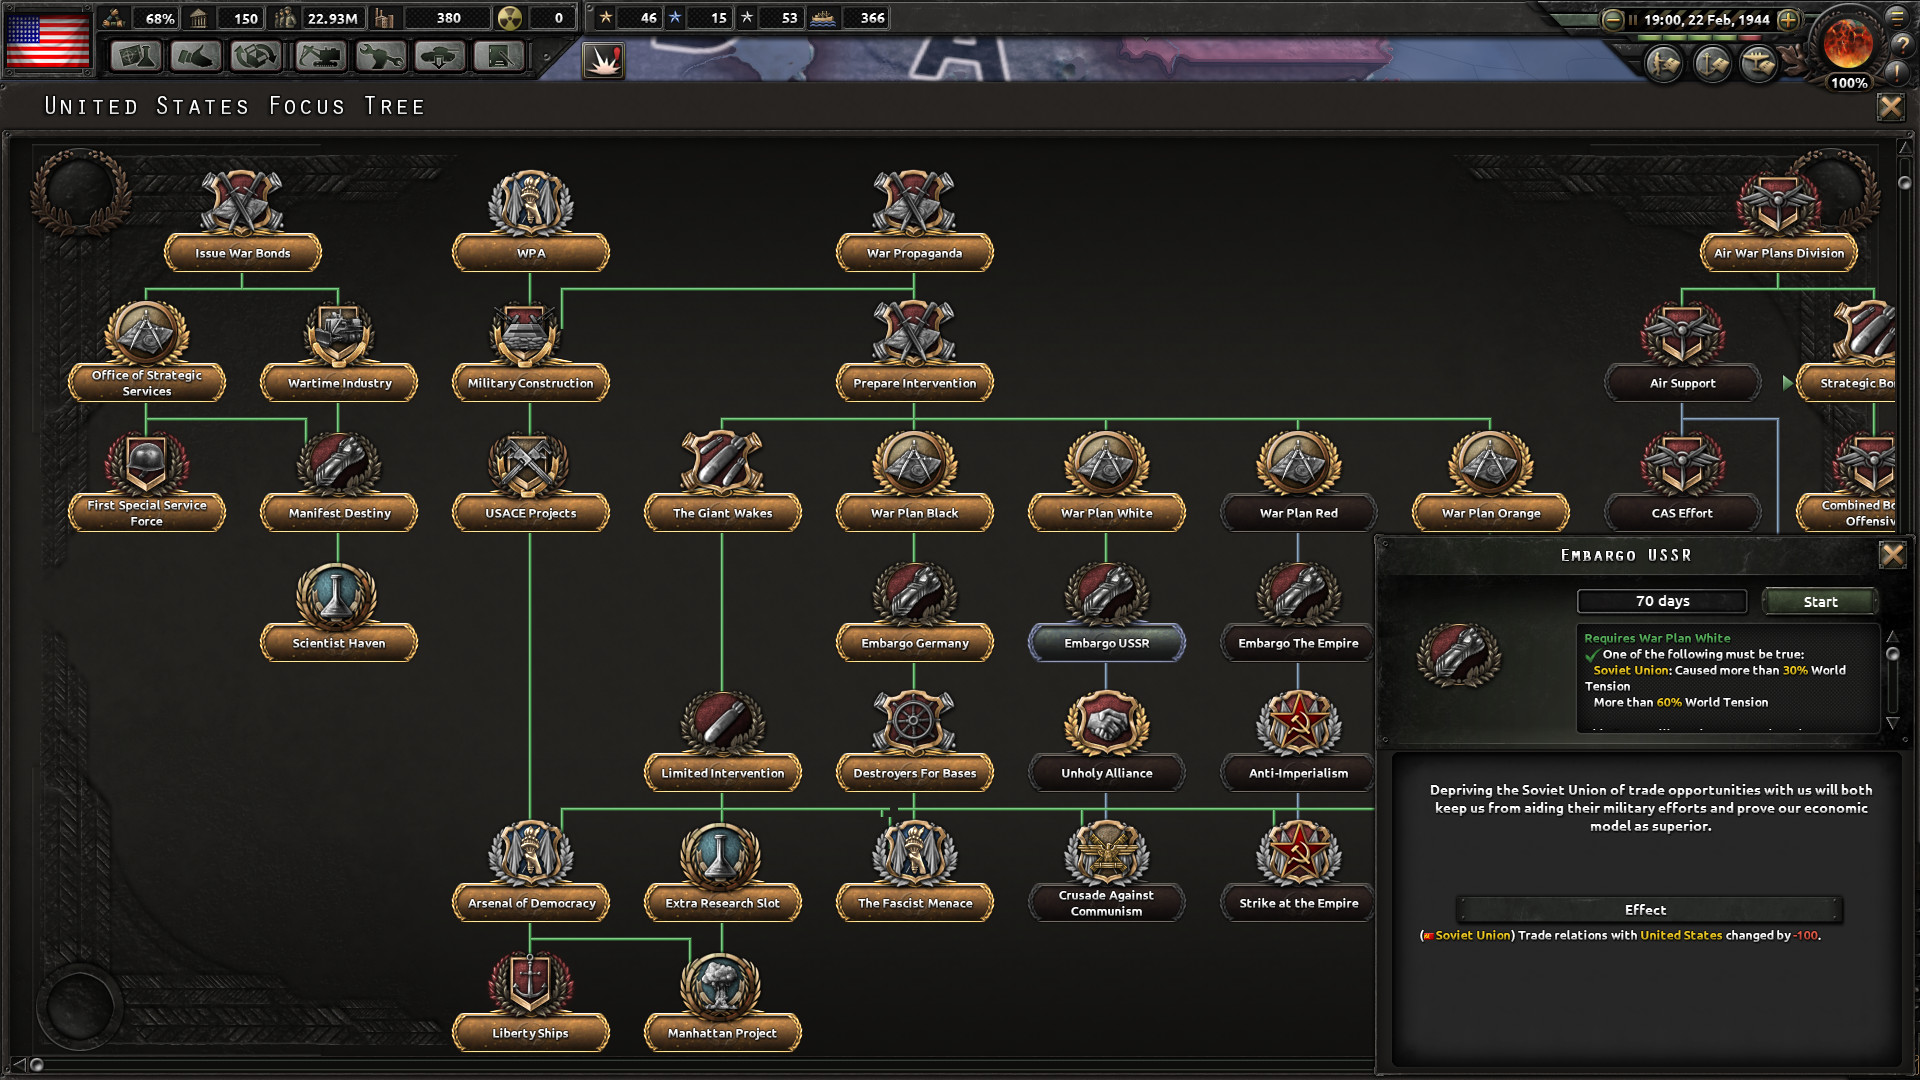 Hearts of Iron IV Screenshot 2